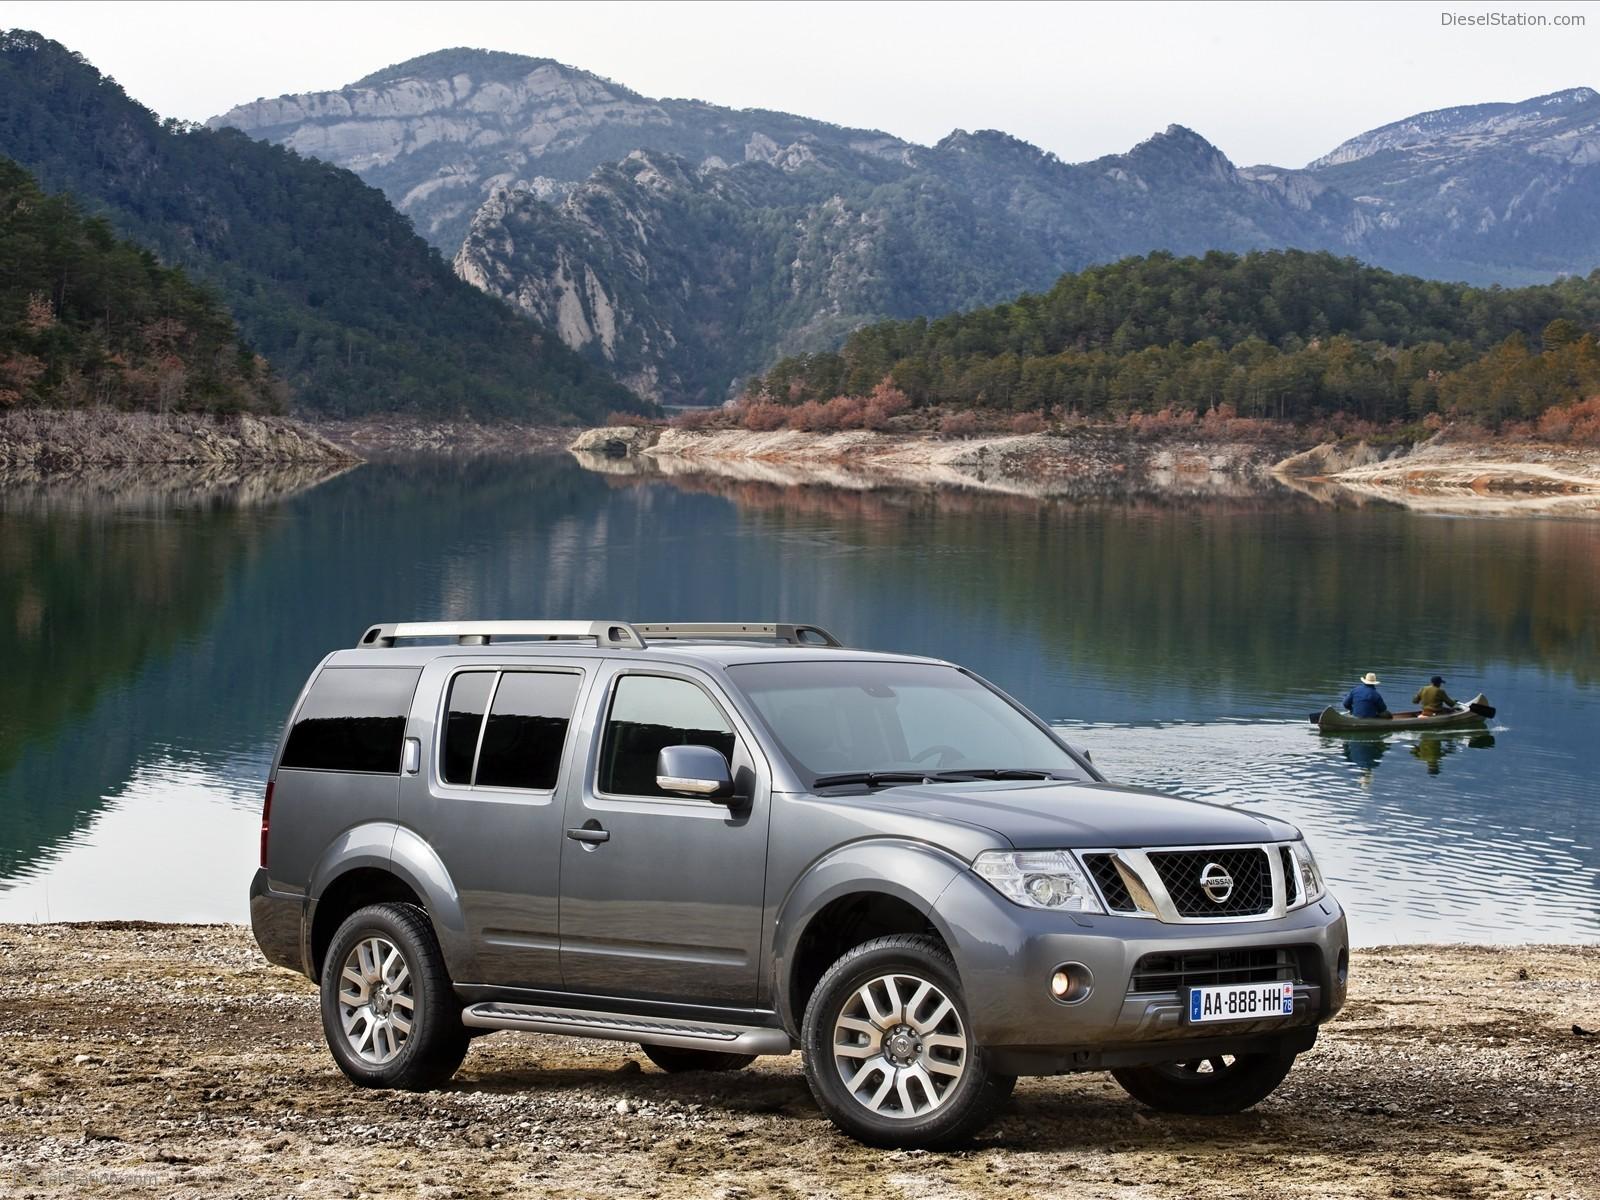 Nissan Pathfinder Lake Wallpaper 65985 1600x1200px 1600x1200